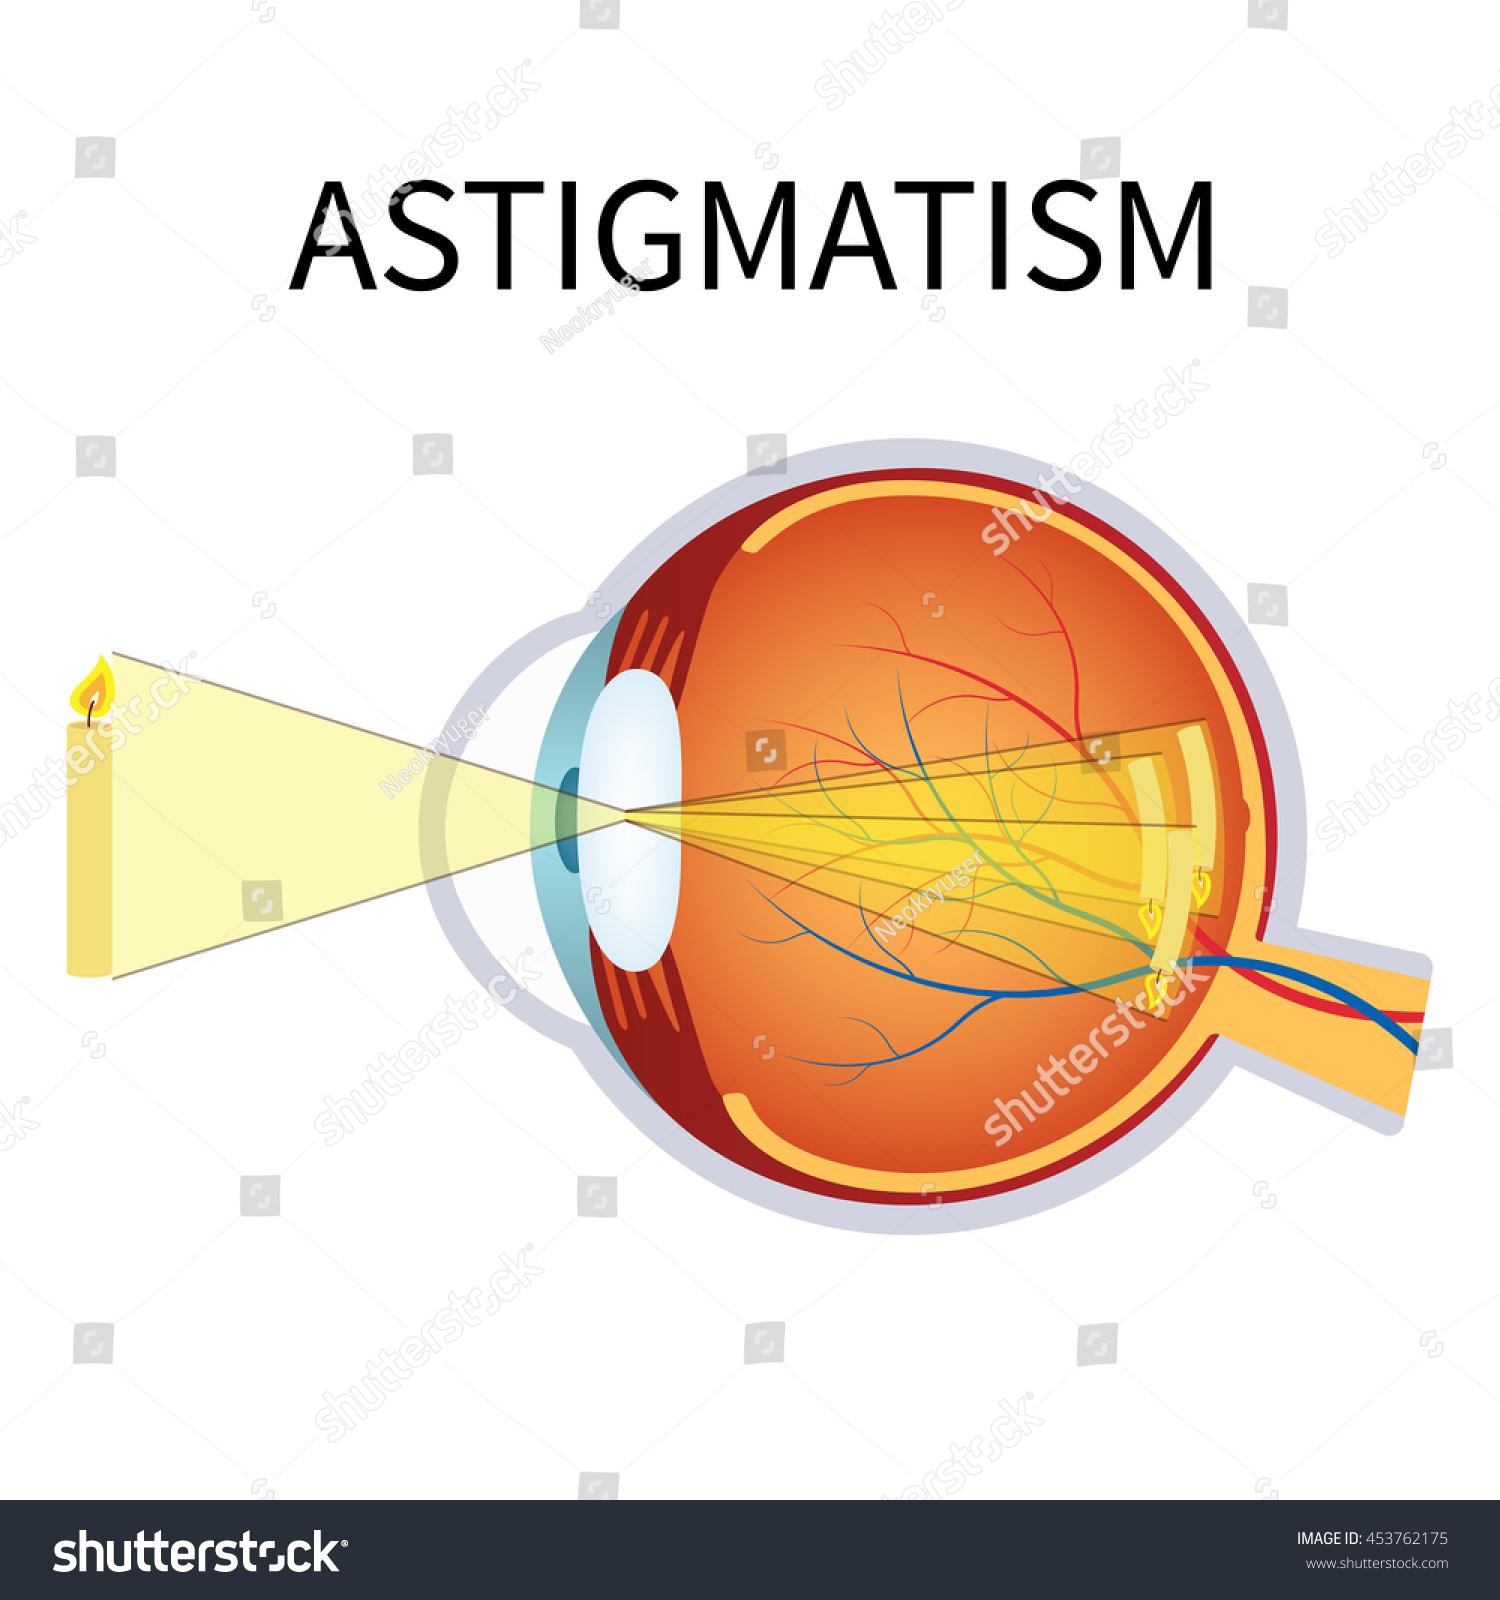 Illustration Astigmatism Astigmatism Blurred Vision Anatomy Stock